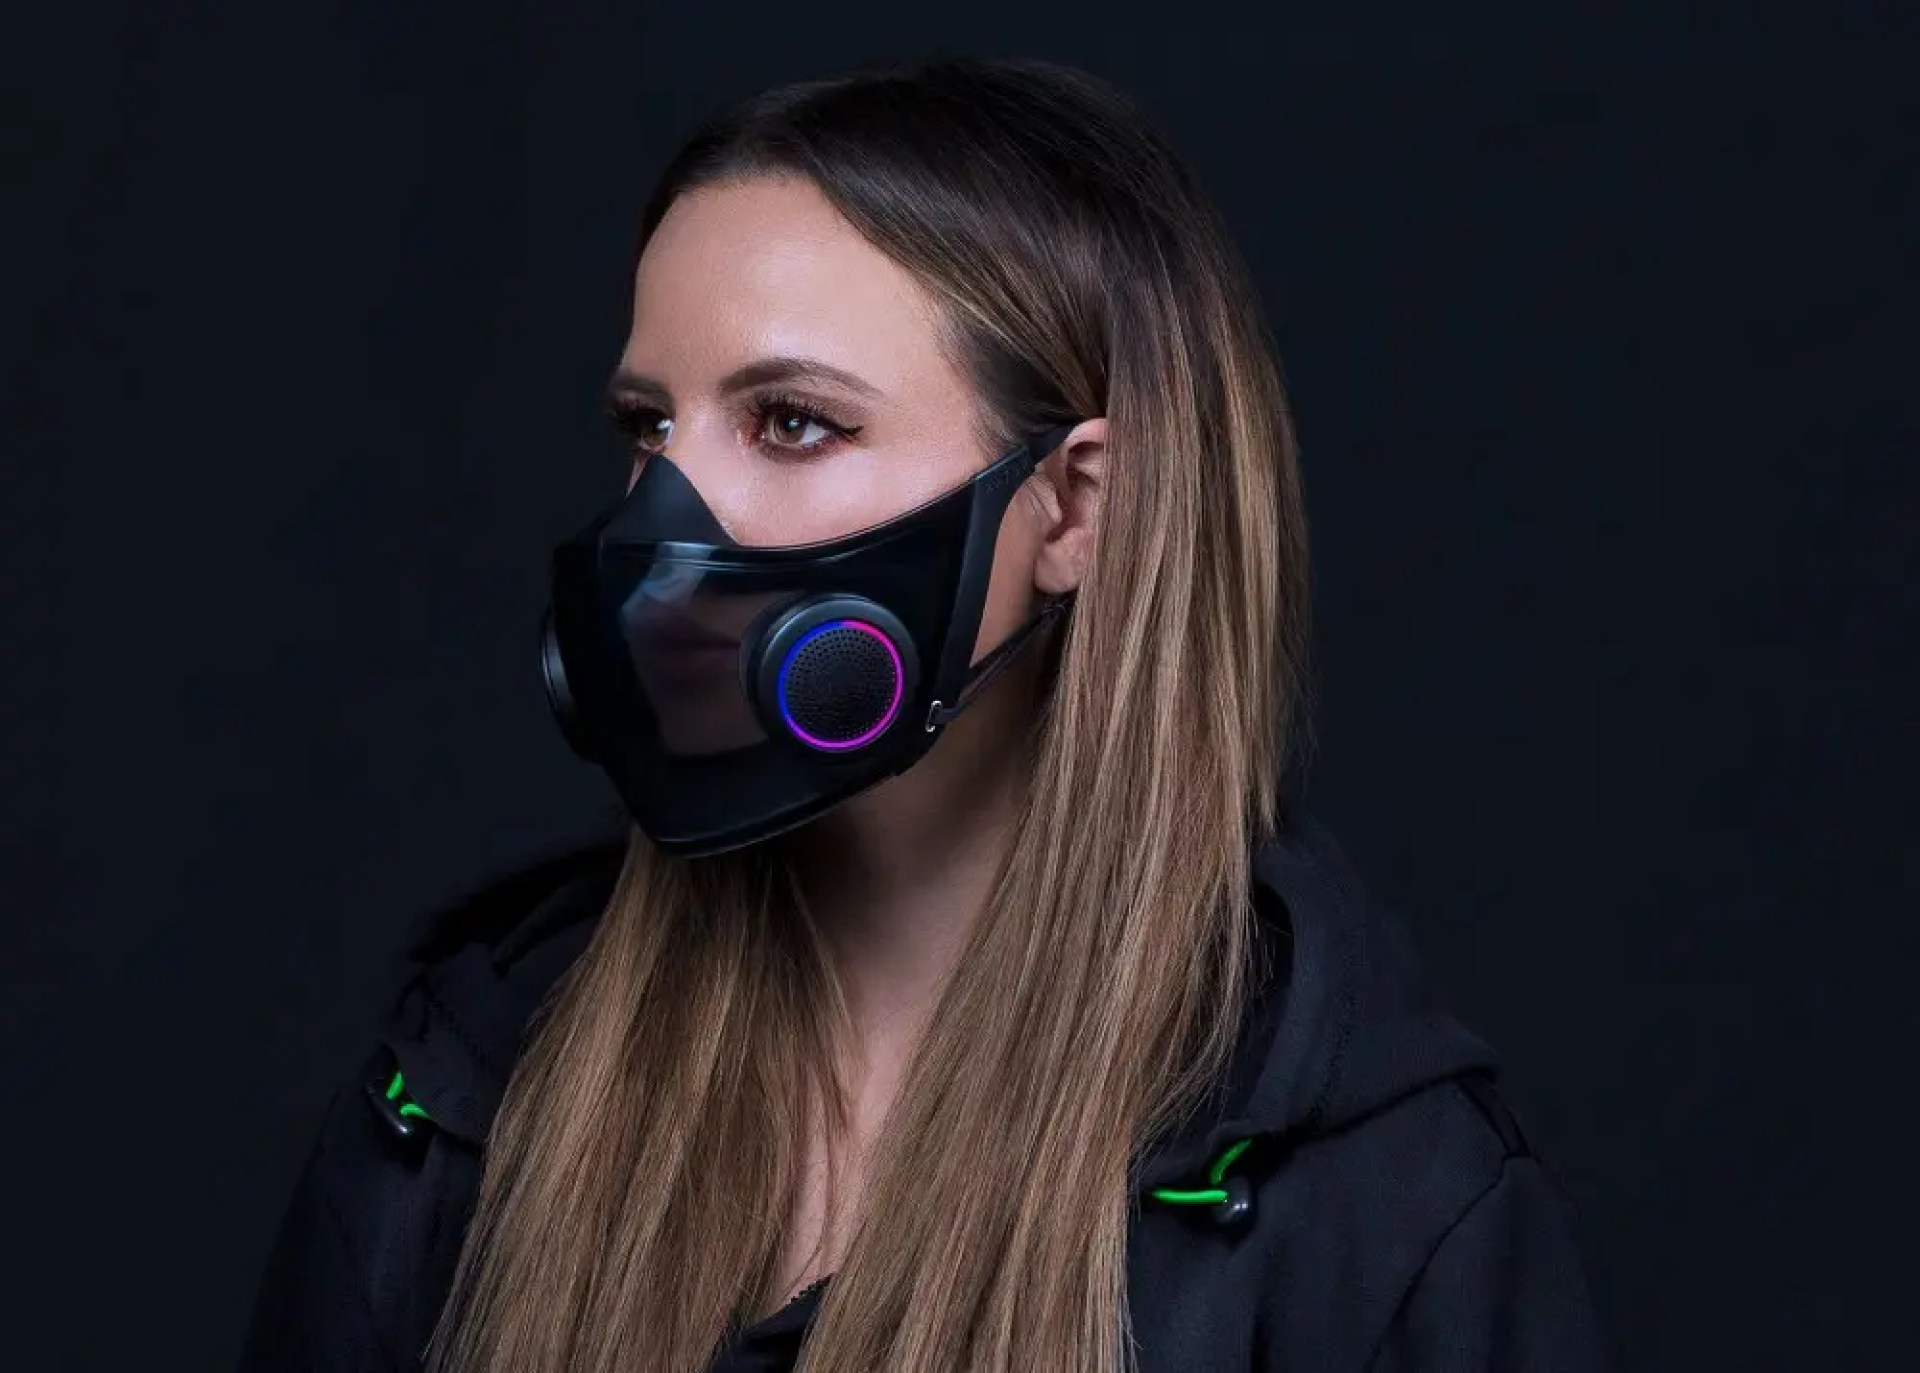 Razer Project Hazel face mask on female model